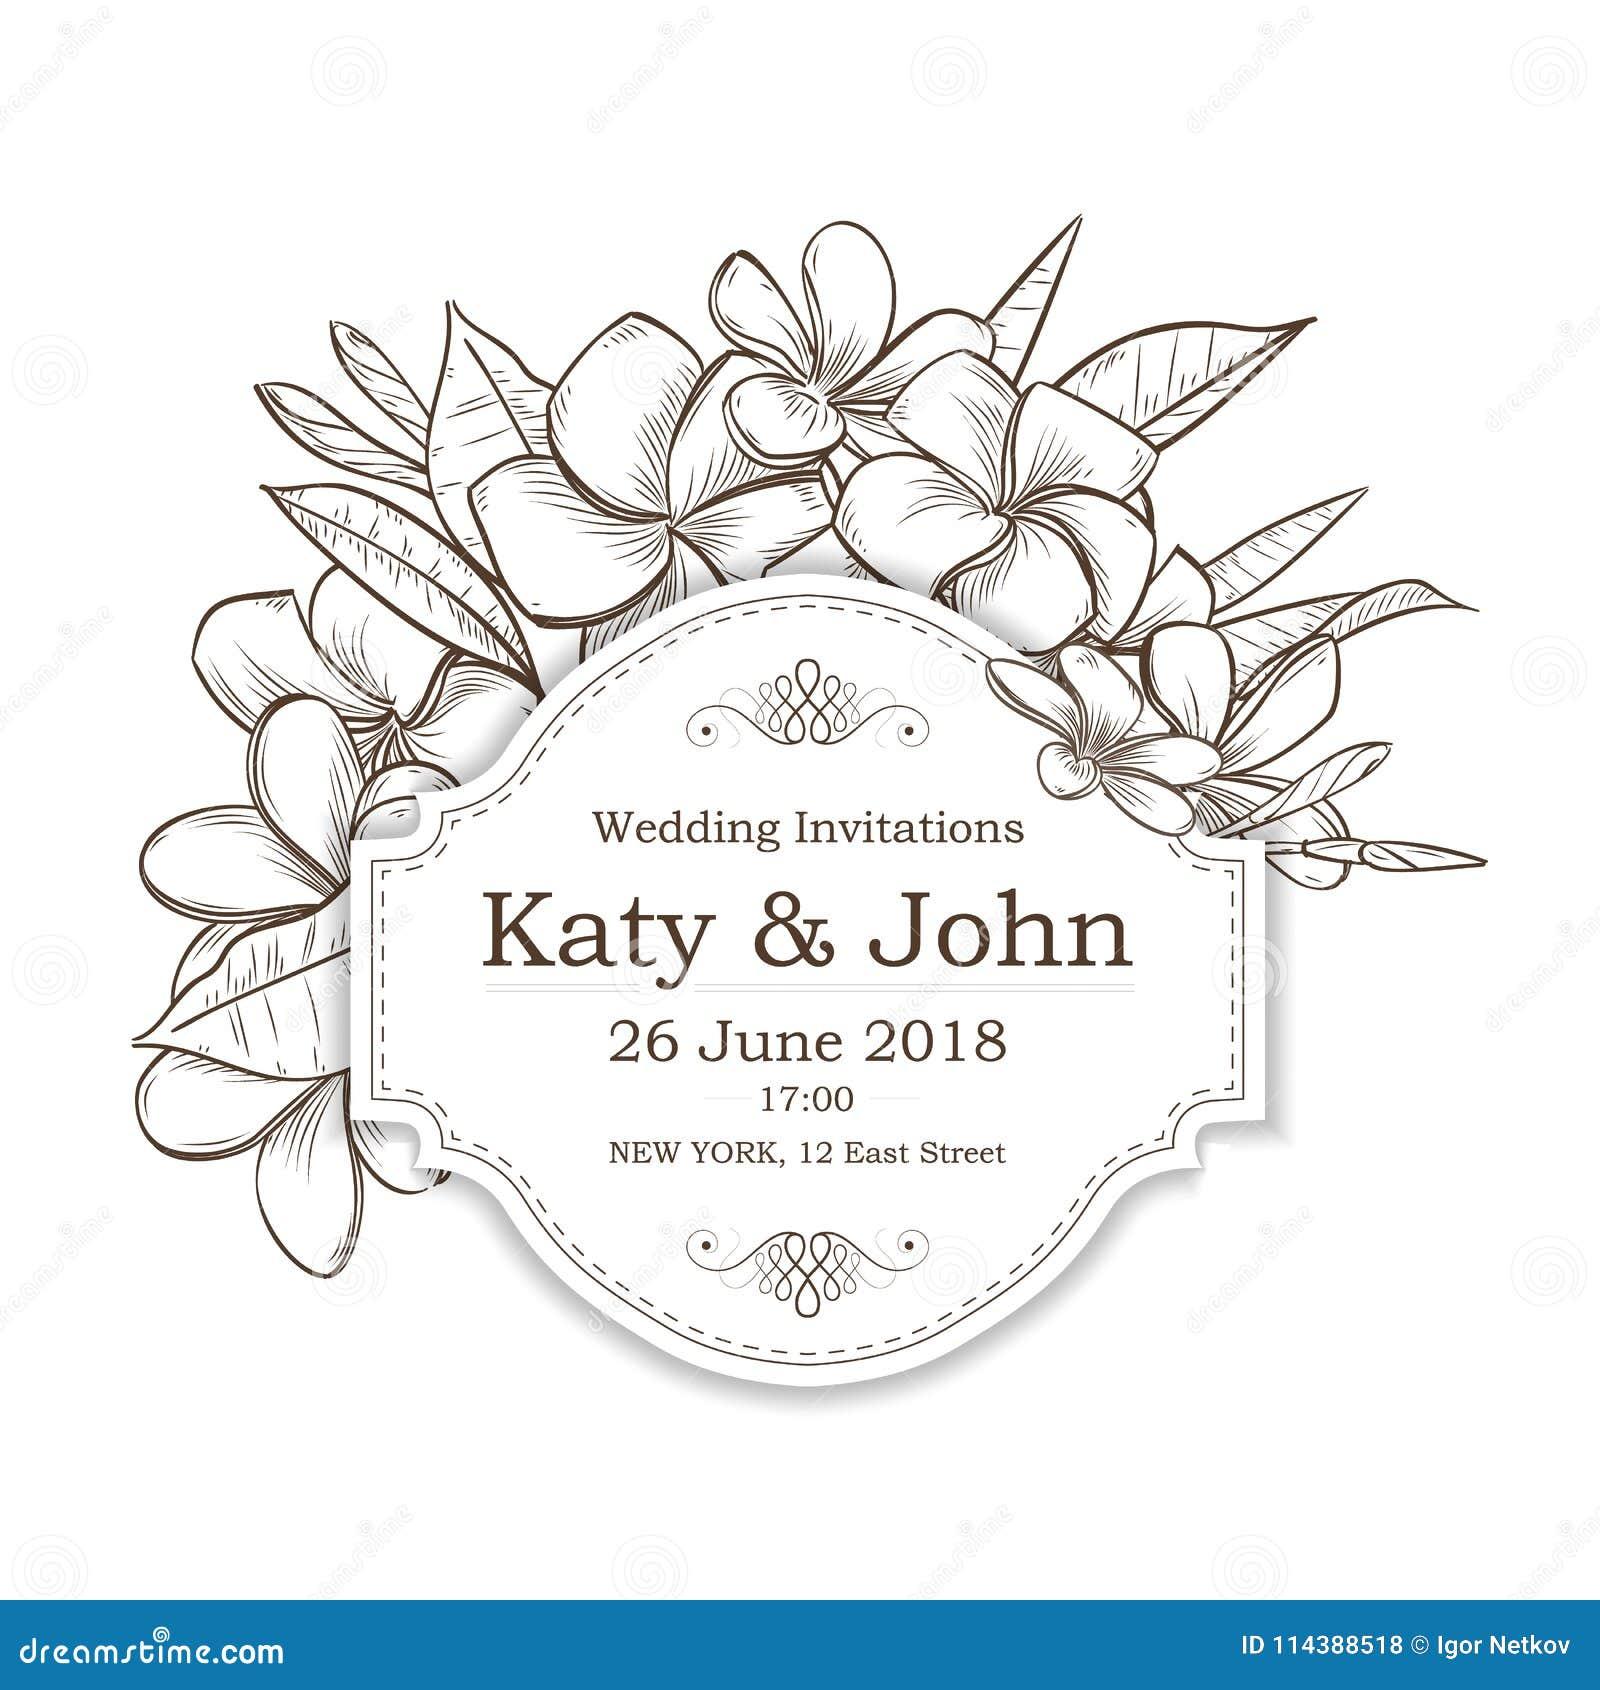 Vector Invitation With Plumeria Flowers Stock Vector Illustration